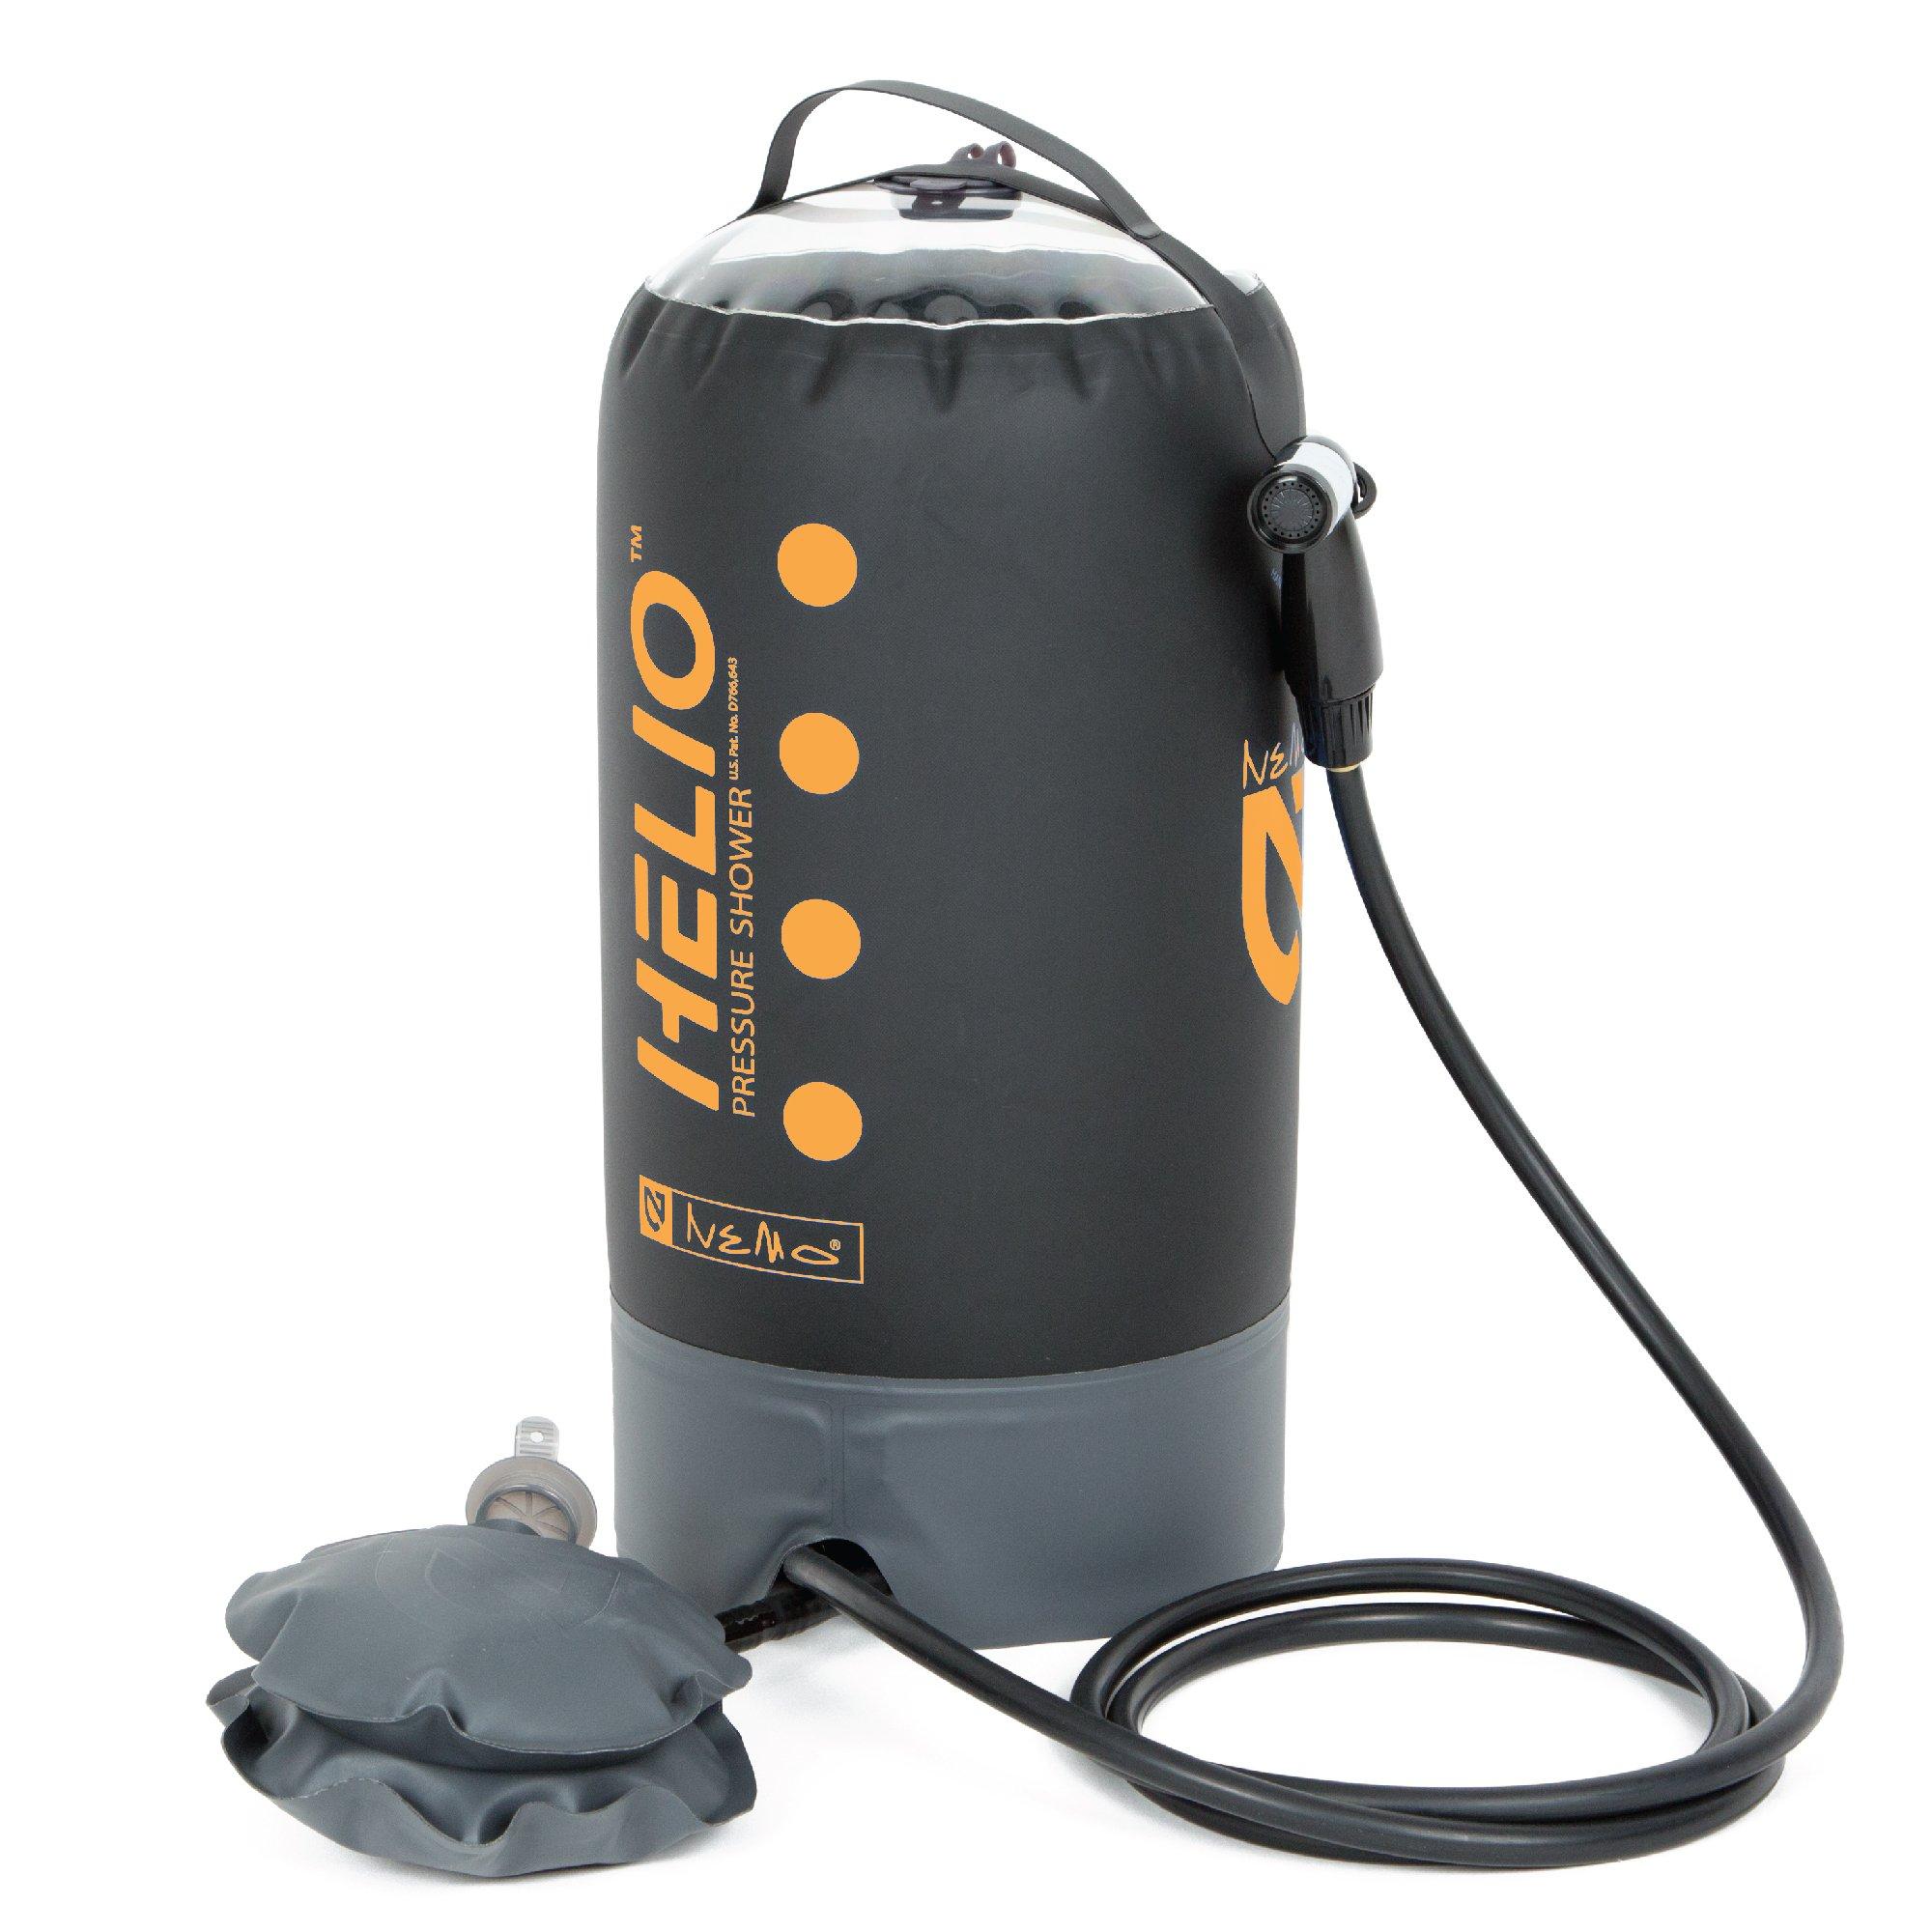 Nemo Helio Portable Pressure Shower with Foot Pump, Black/Sunset